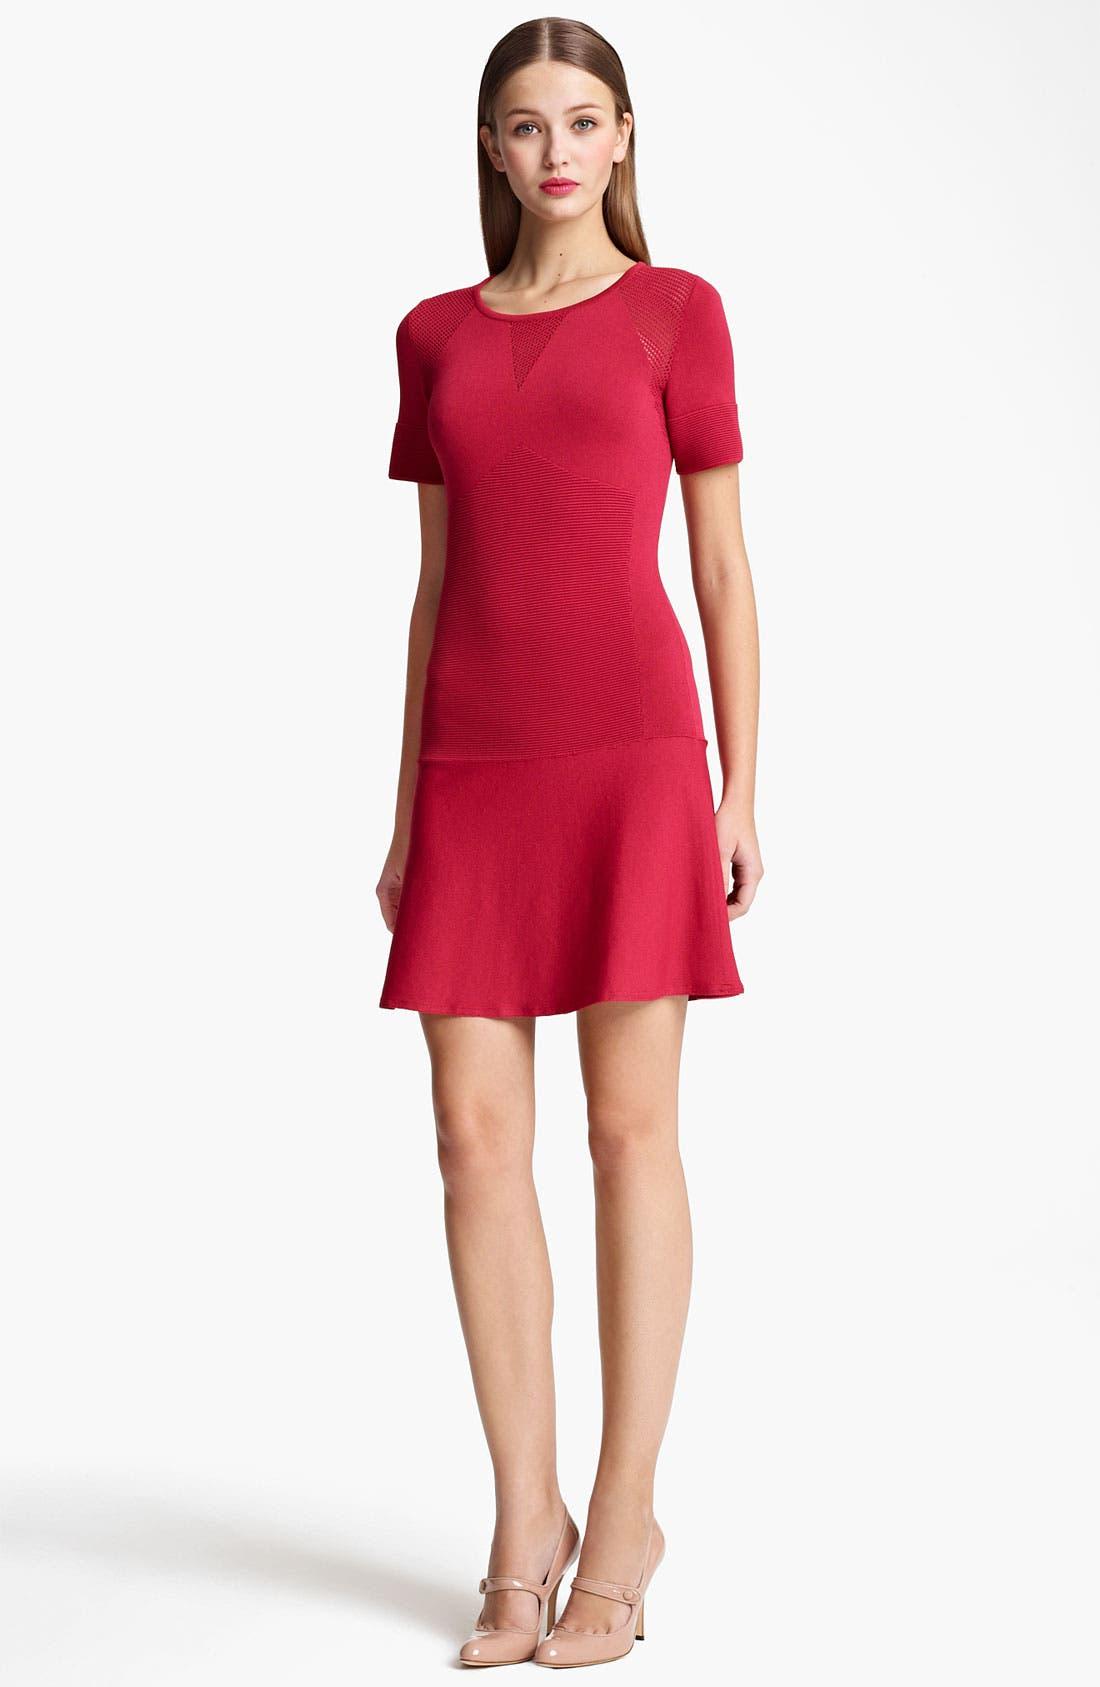 Main Image - Moschino Cheap & Chic Drop Waist Knit Dress